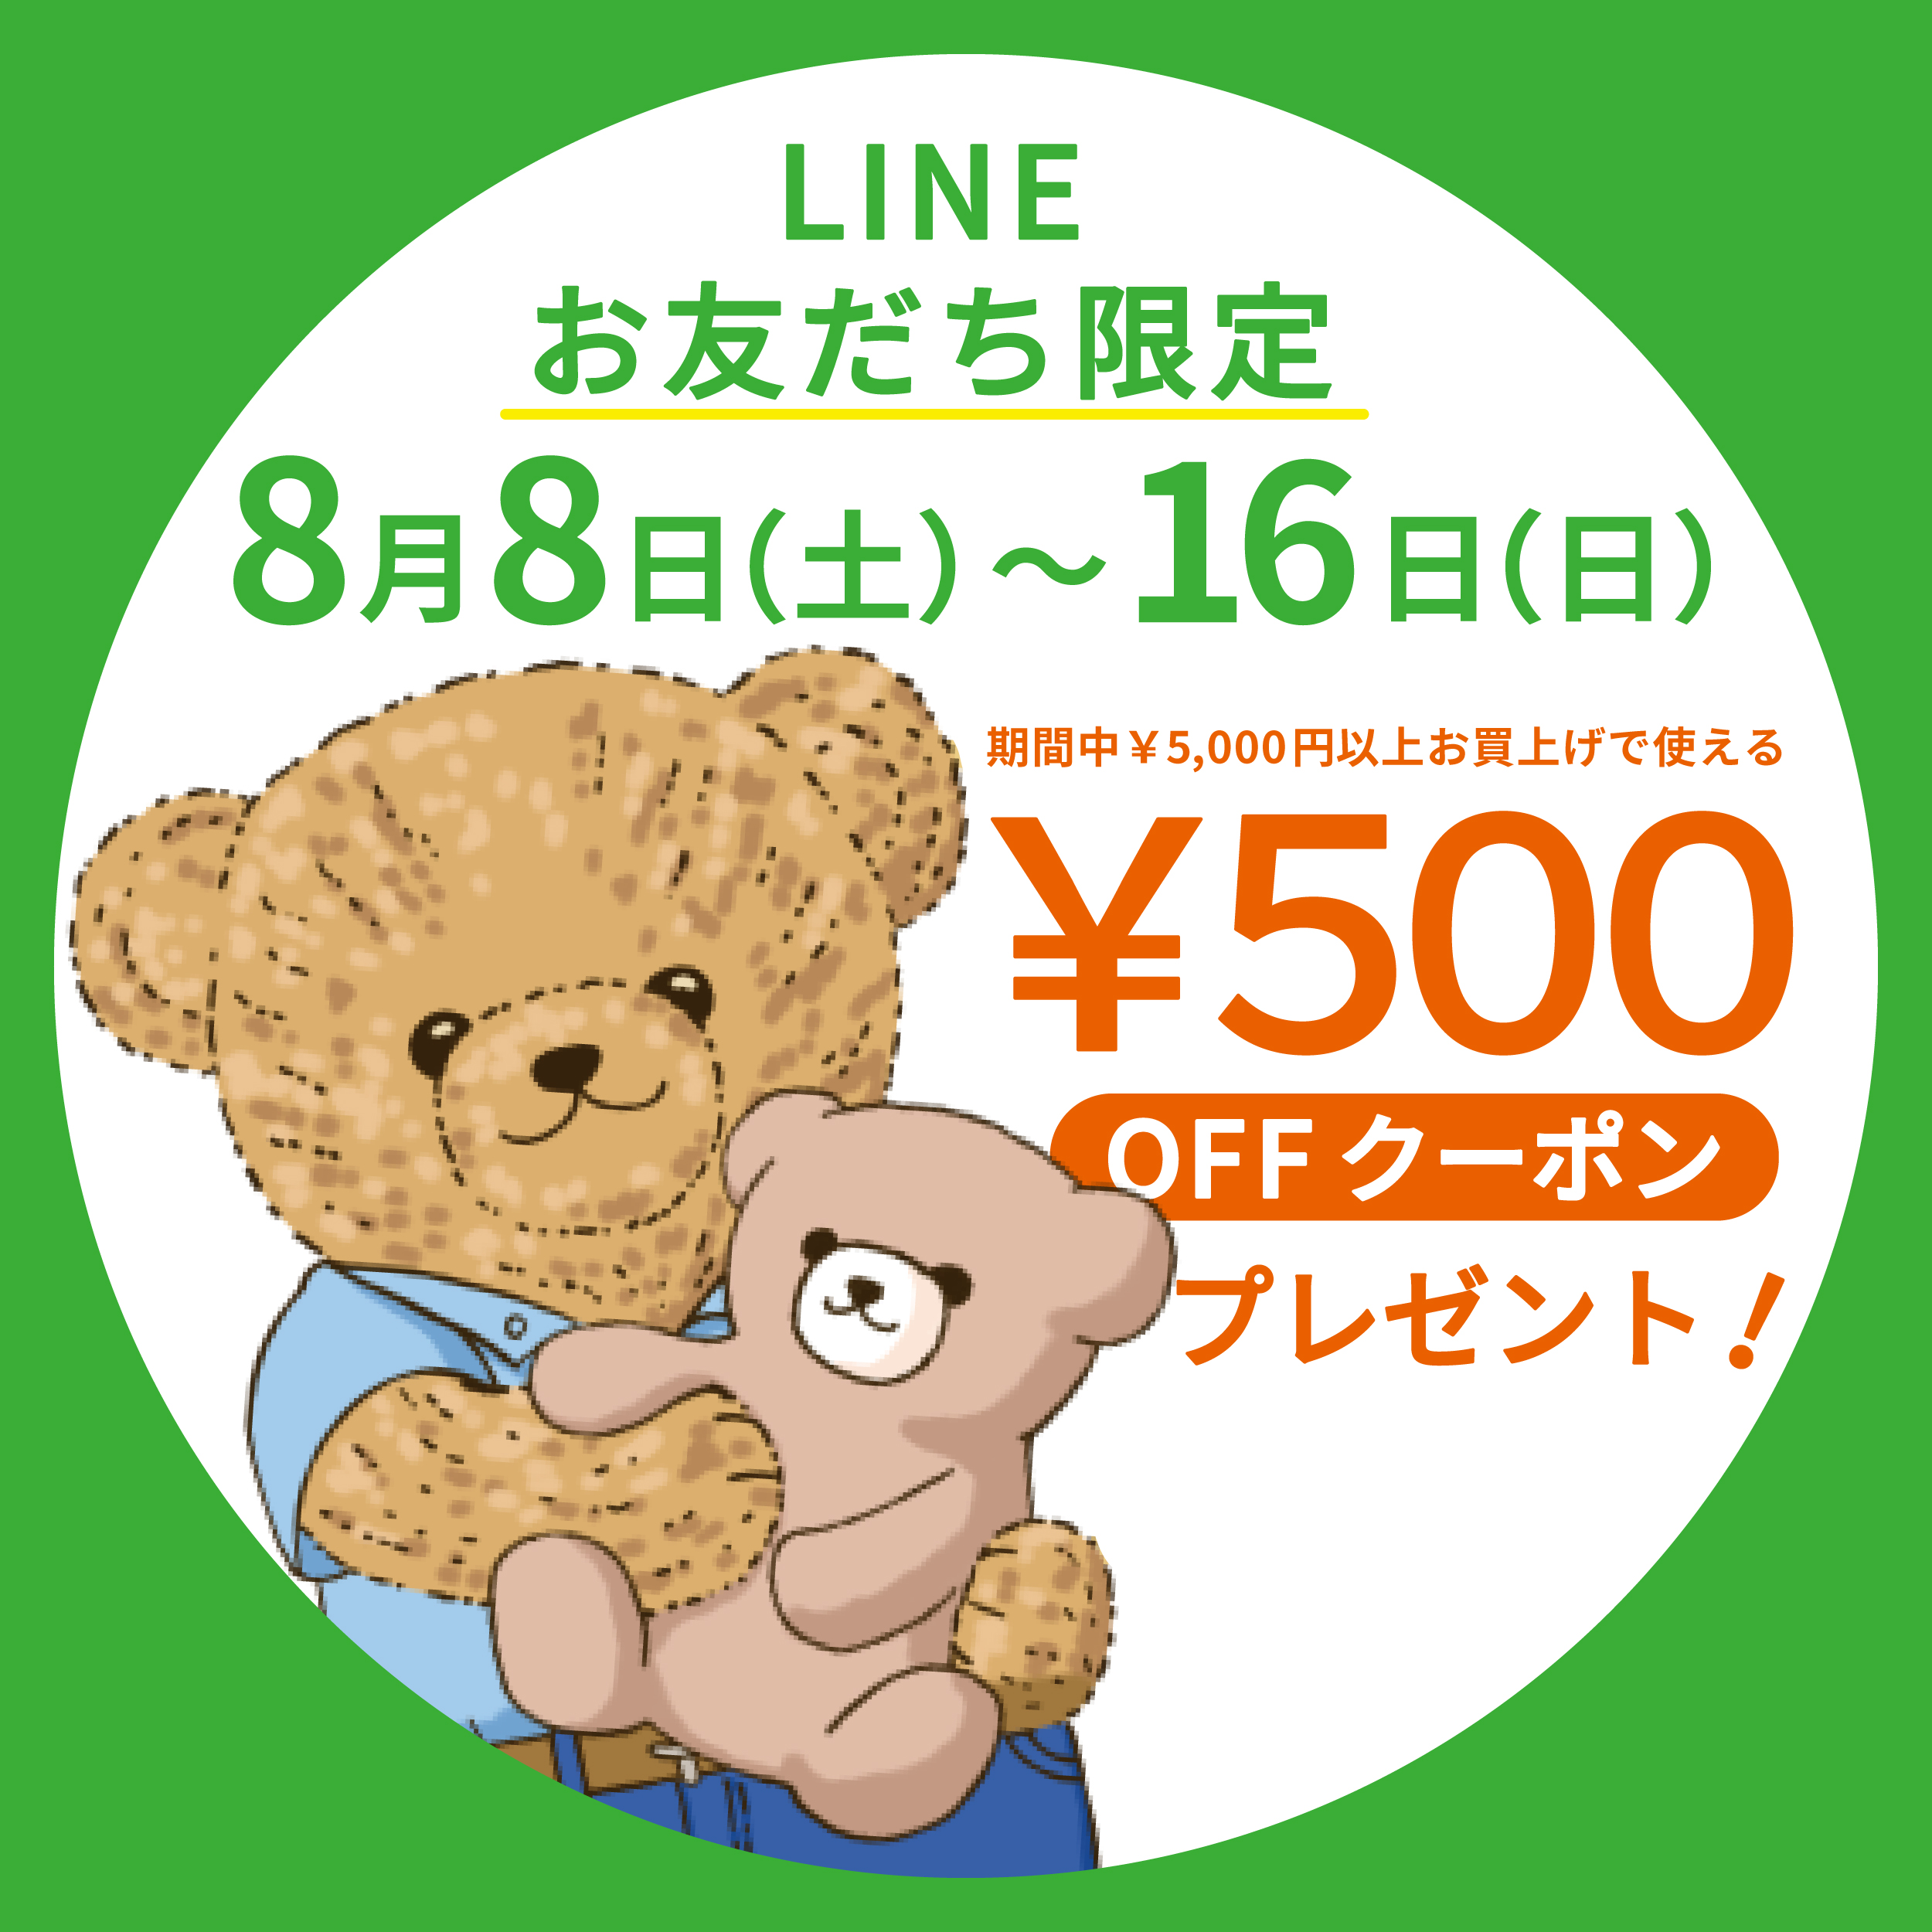 Golden Bear </br>LINEお友だちクーポンキャンペーン